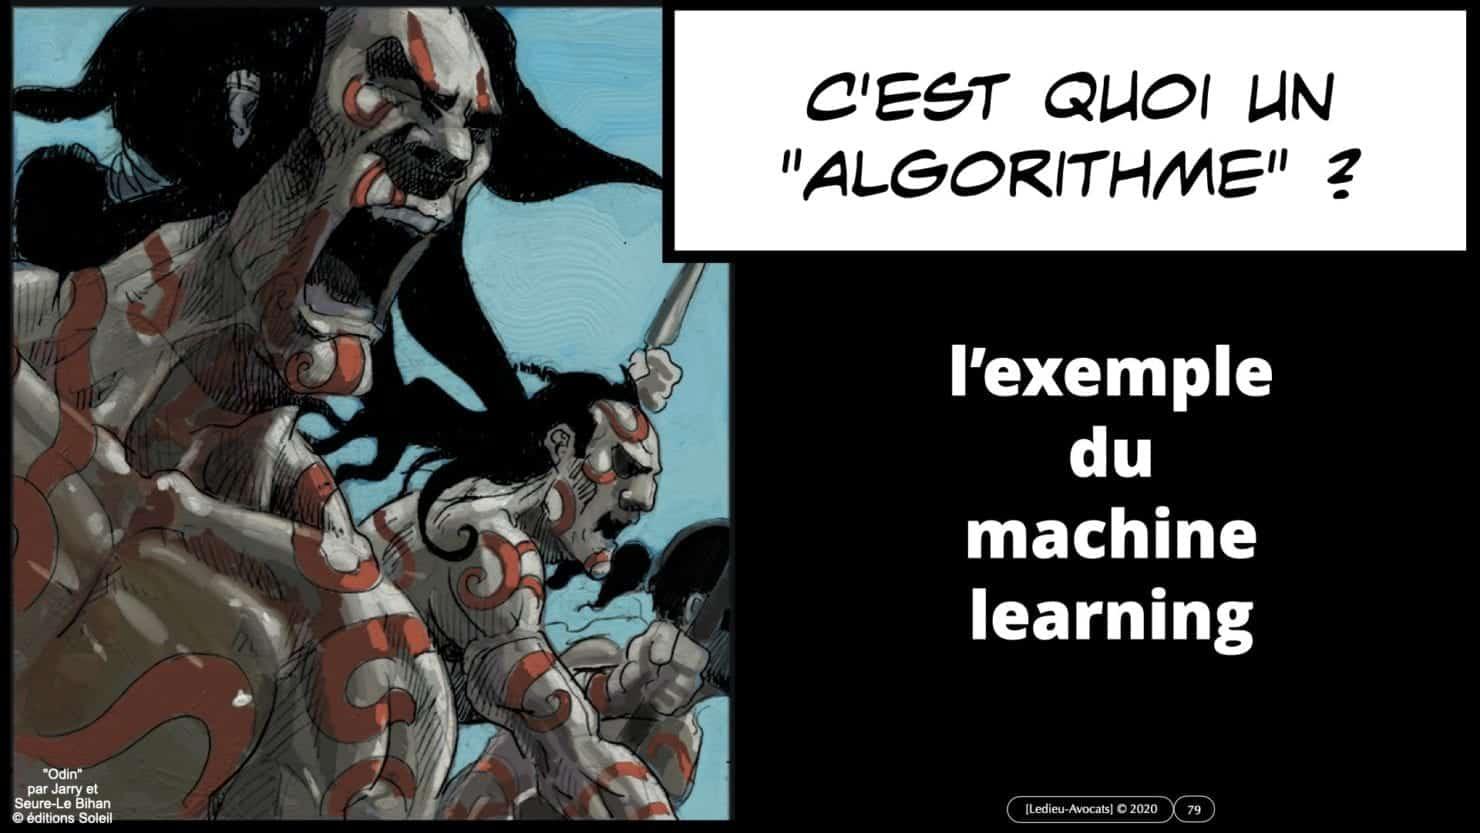 307 Intelligence artificielle-machine-learning-deep-learning-base de données-BIG-DATA *16:9* Constellation ©Ledieu-Avocat-13-10-2020.079